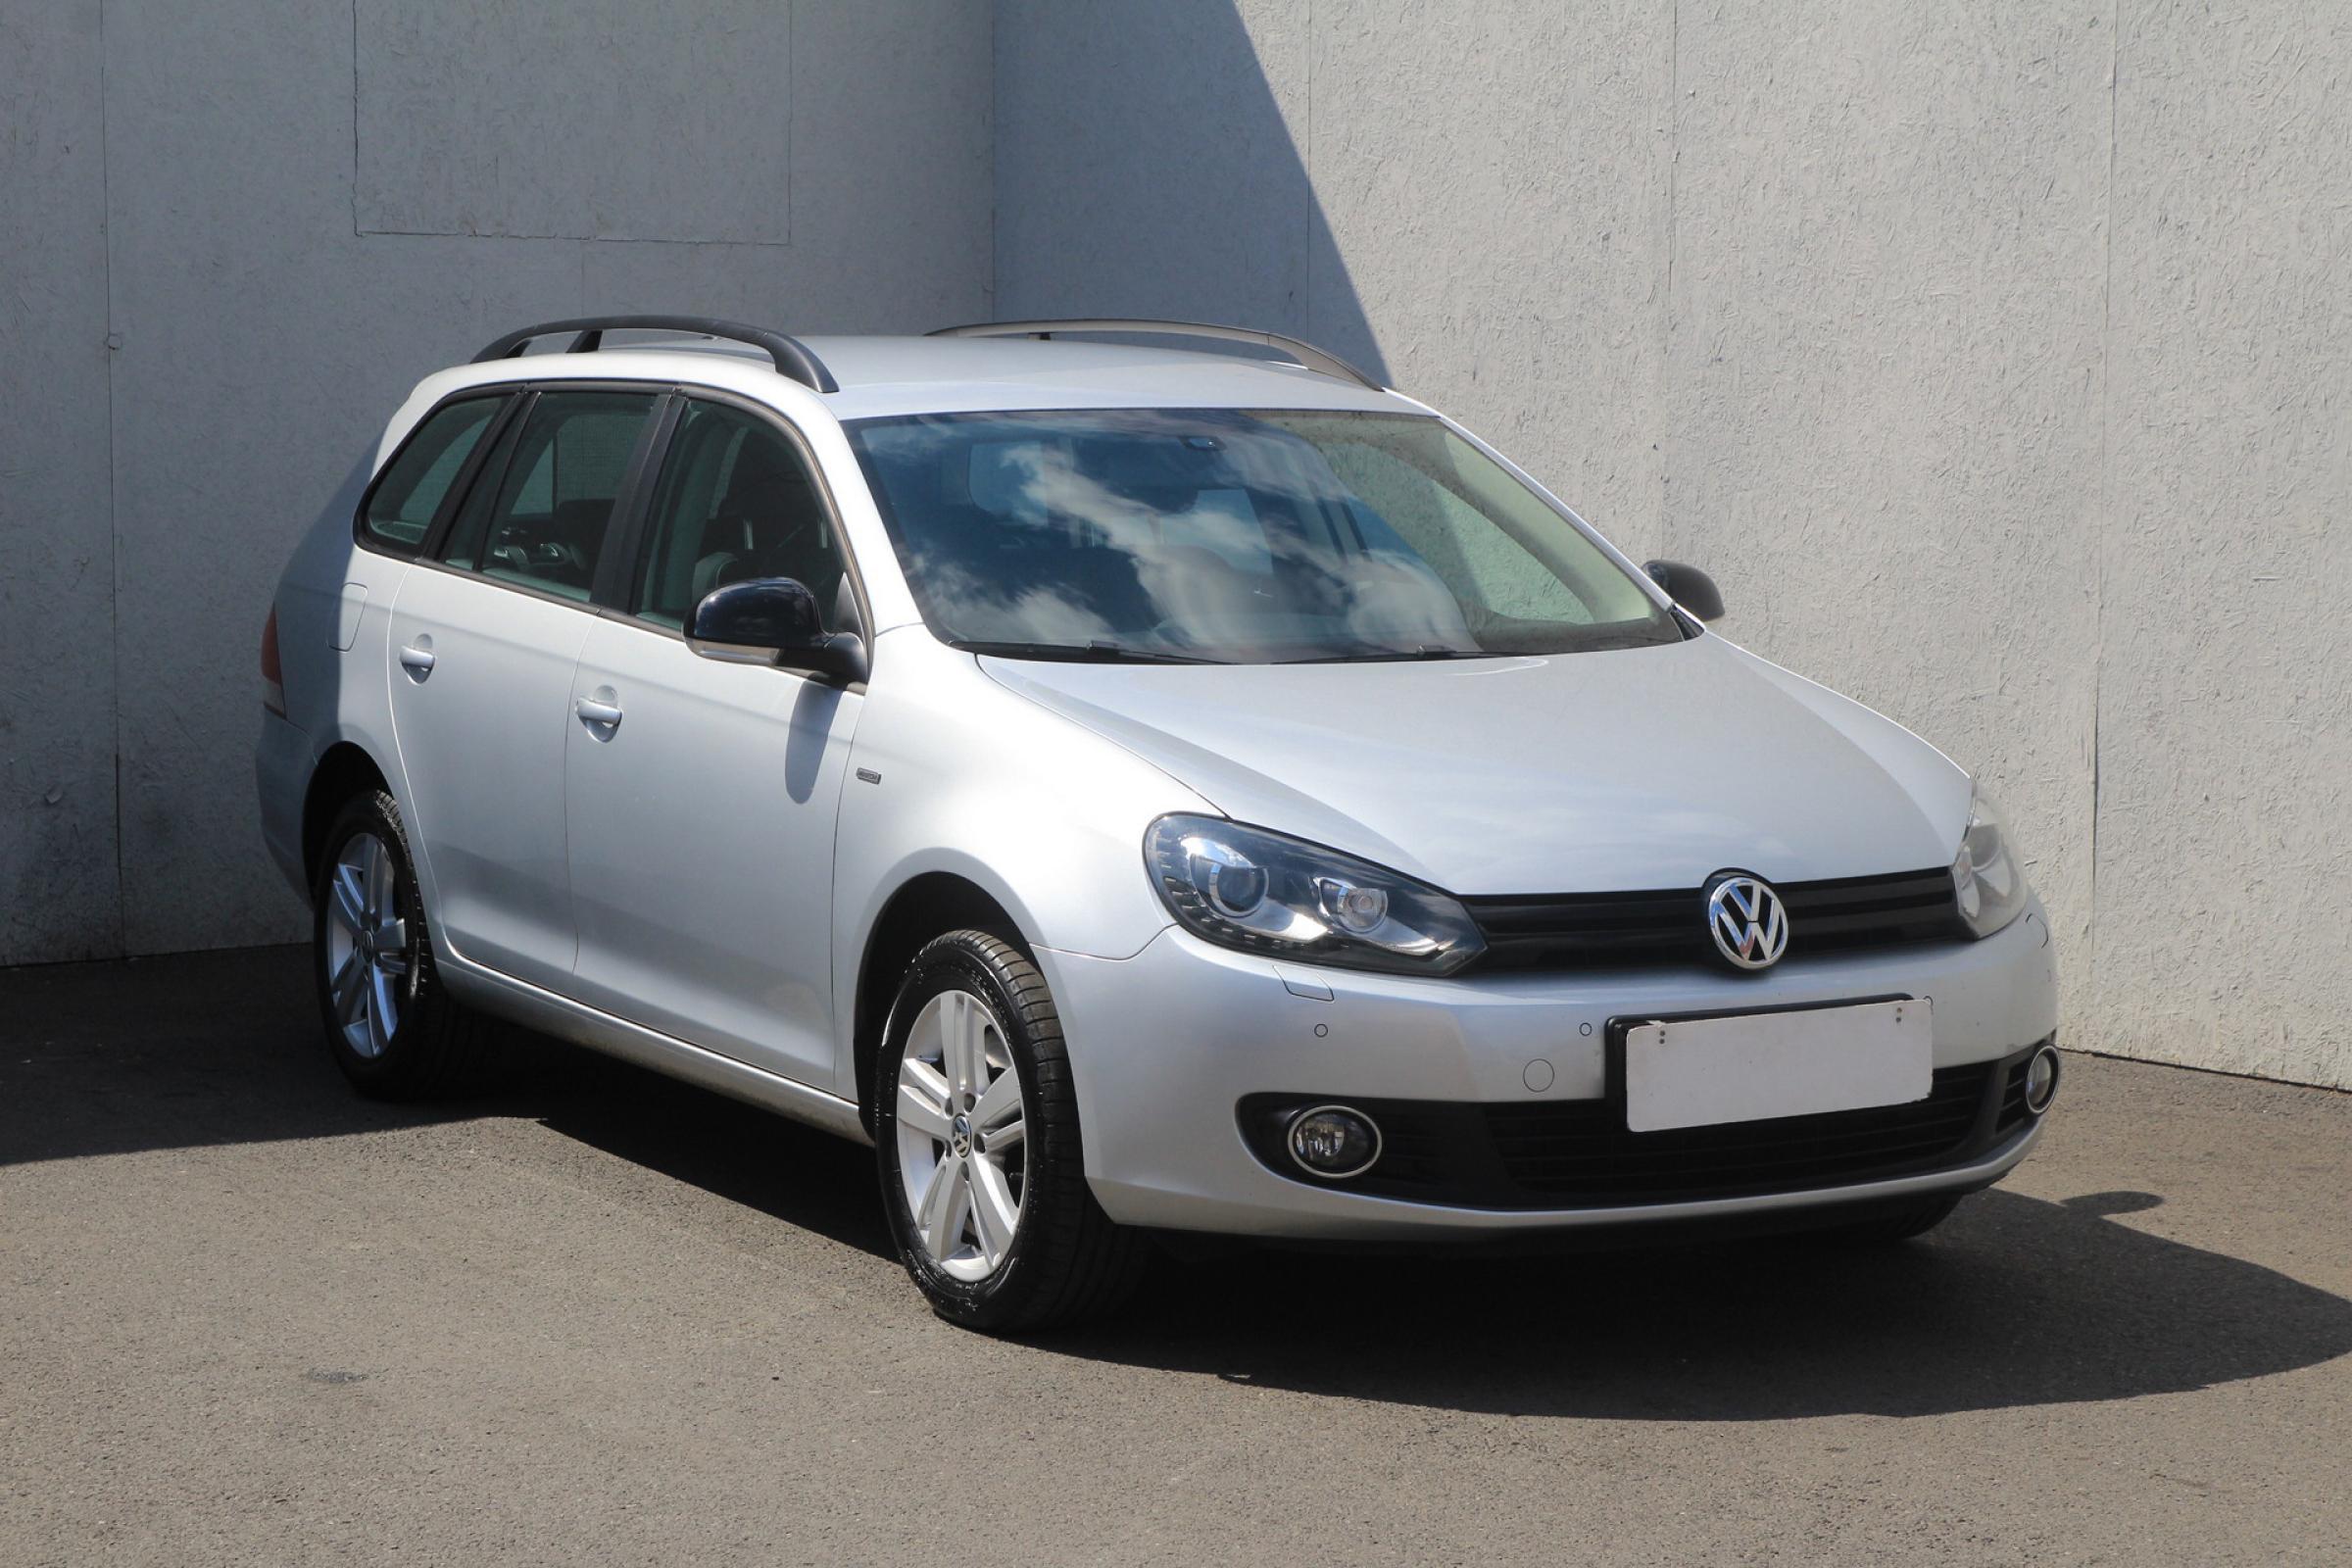 Volkswagen Golf 2.0 TDi Match